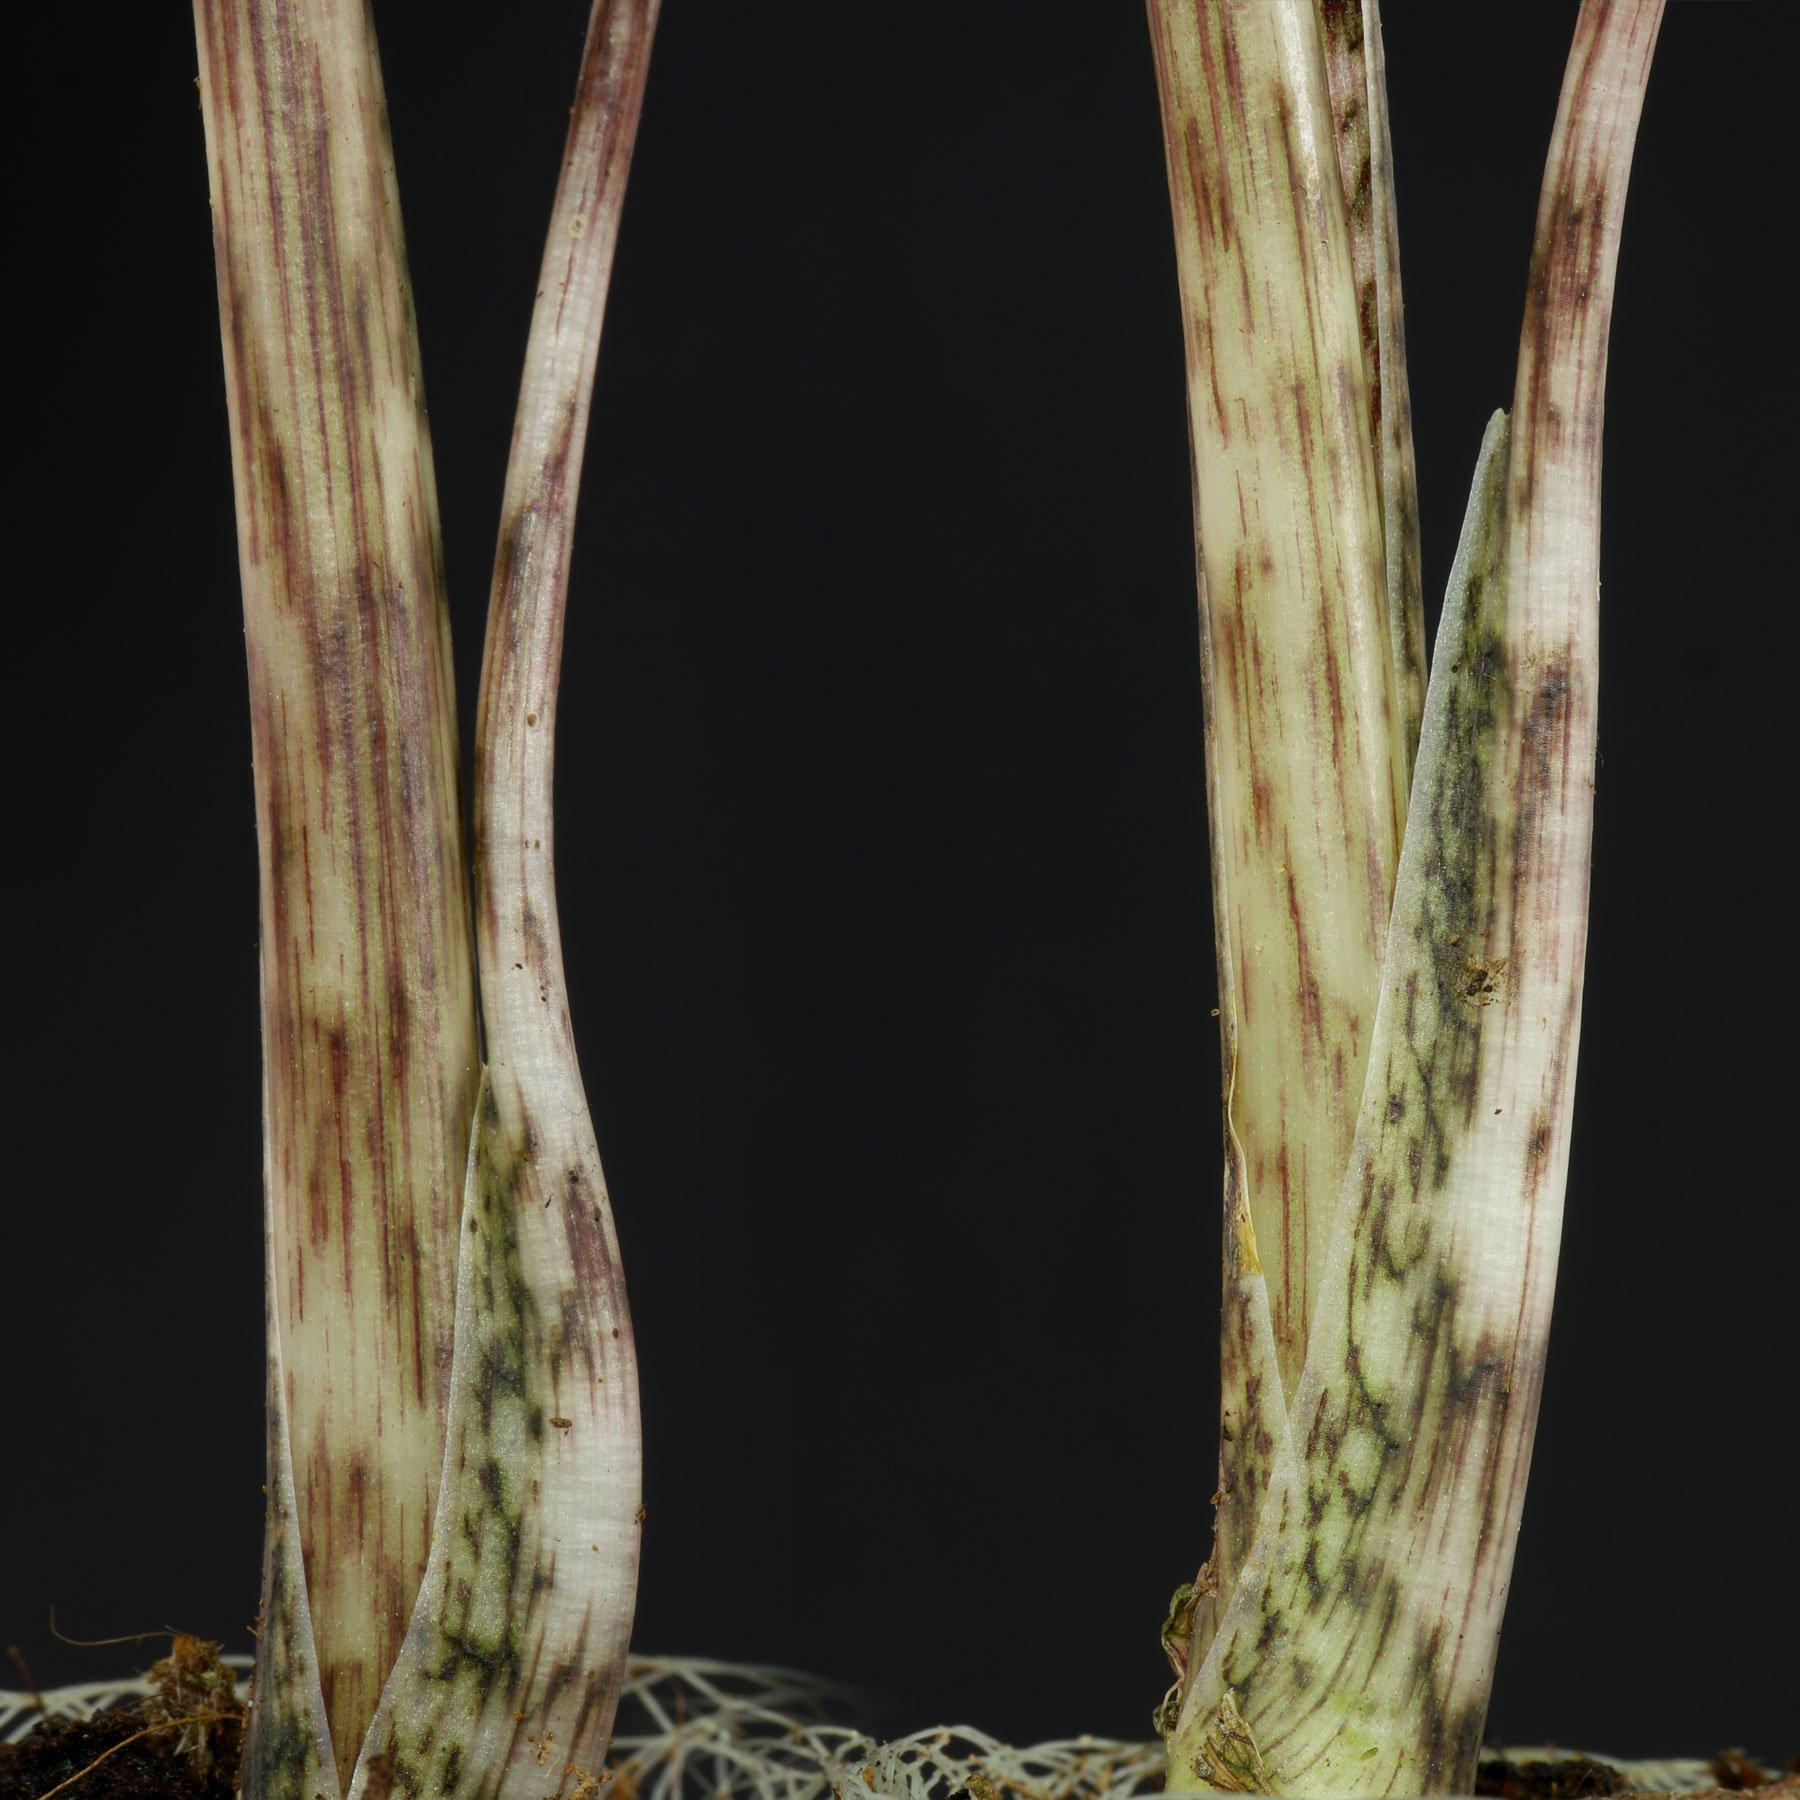 Alocasia zebrina Blattstiele